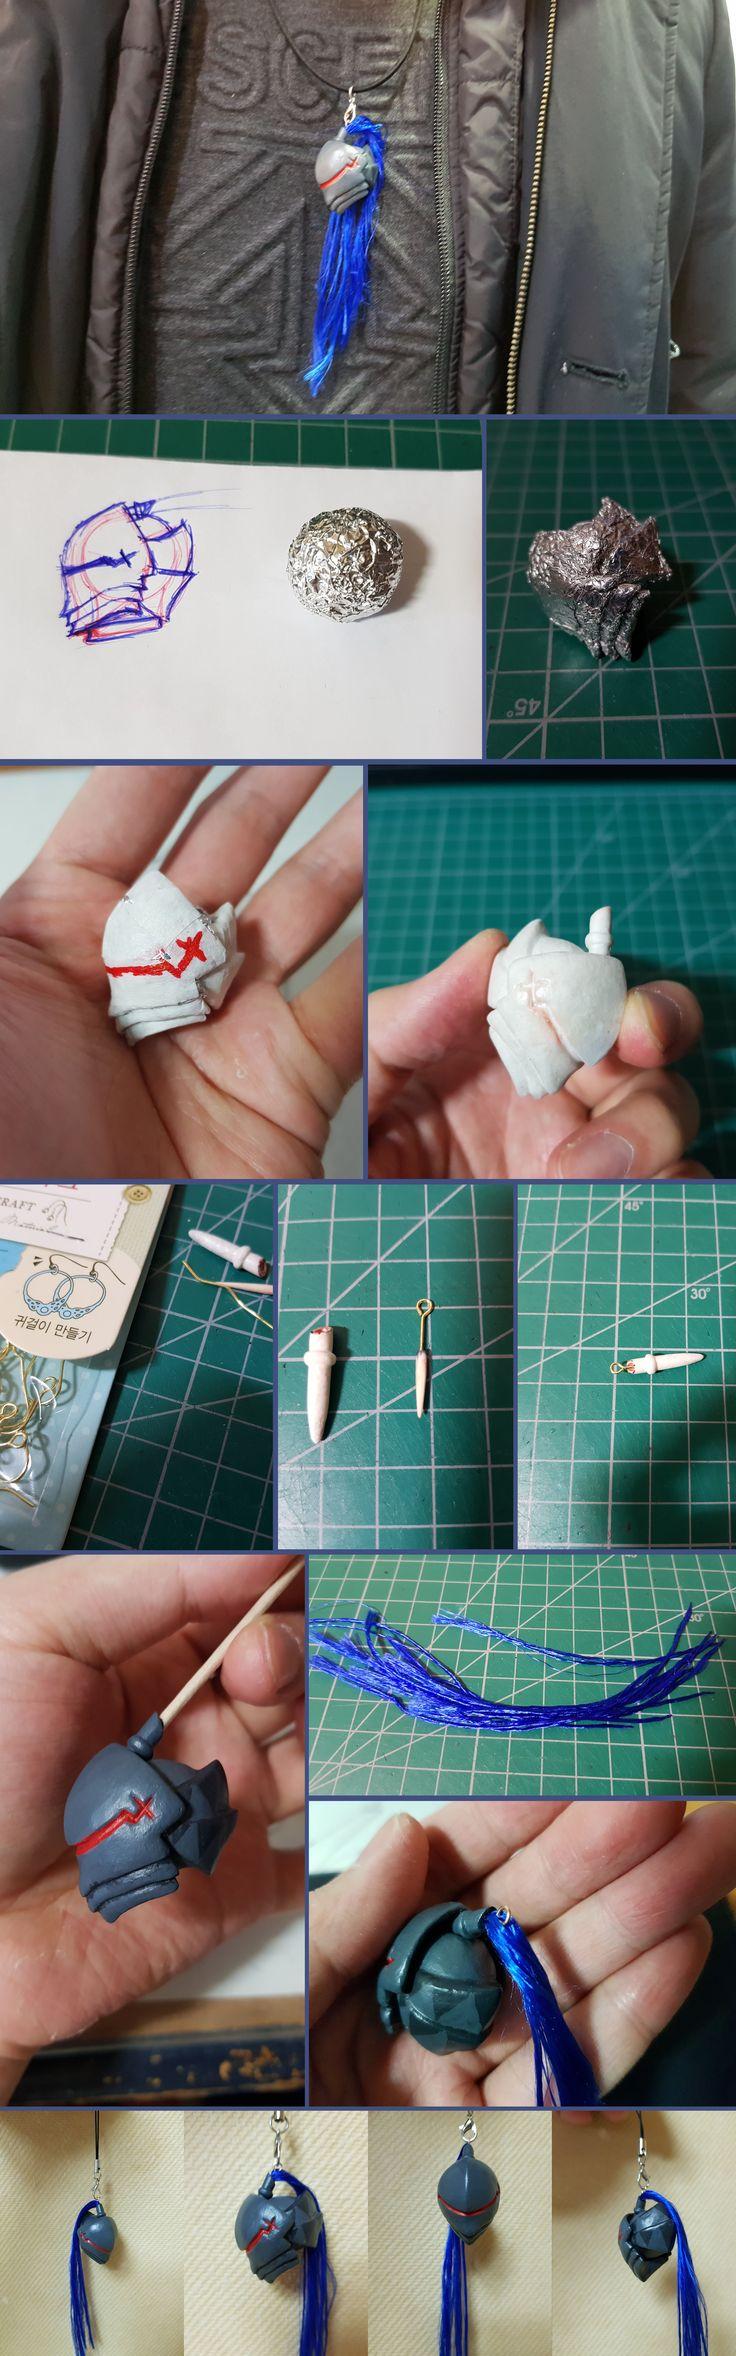 FATE LANCELOT BERSERKER HELMET ACCESSORY DIY with aluminium foil, paper towel (papermache), acrylic paint, etc.